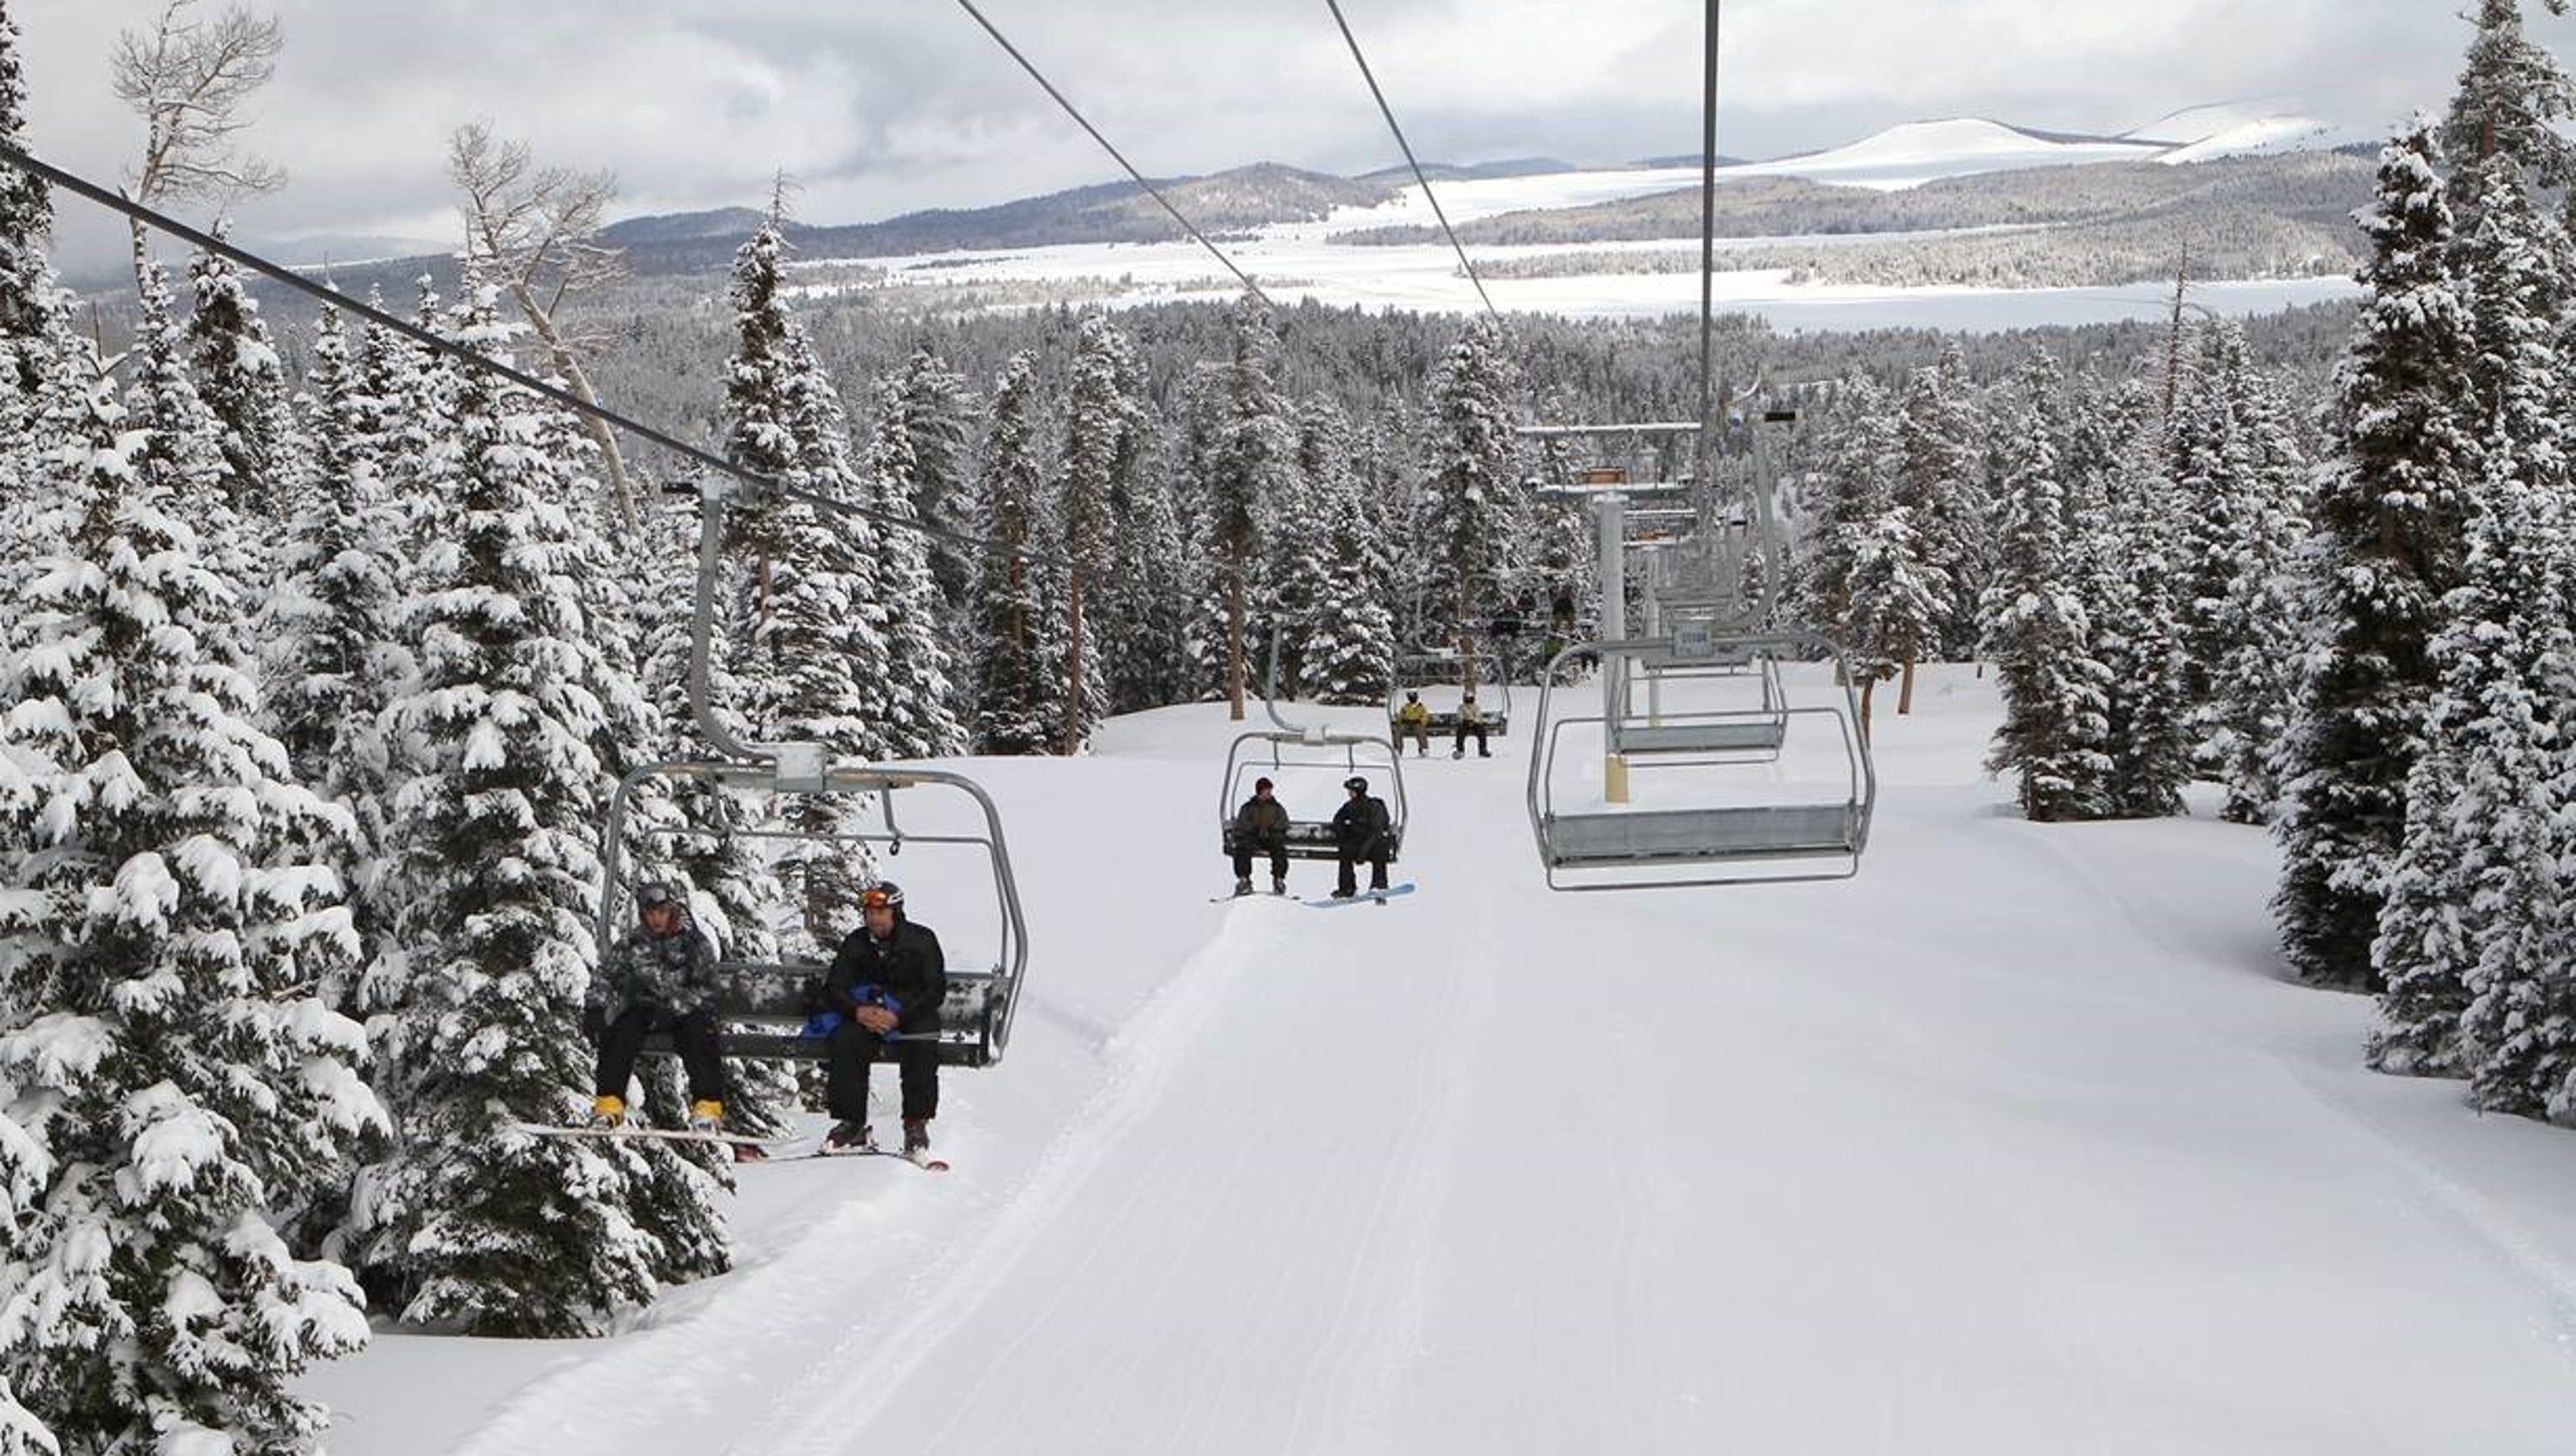 sunrise park ski resort to open dec. 22